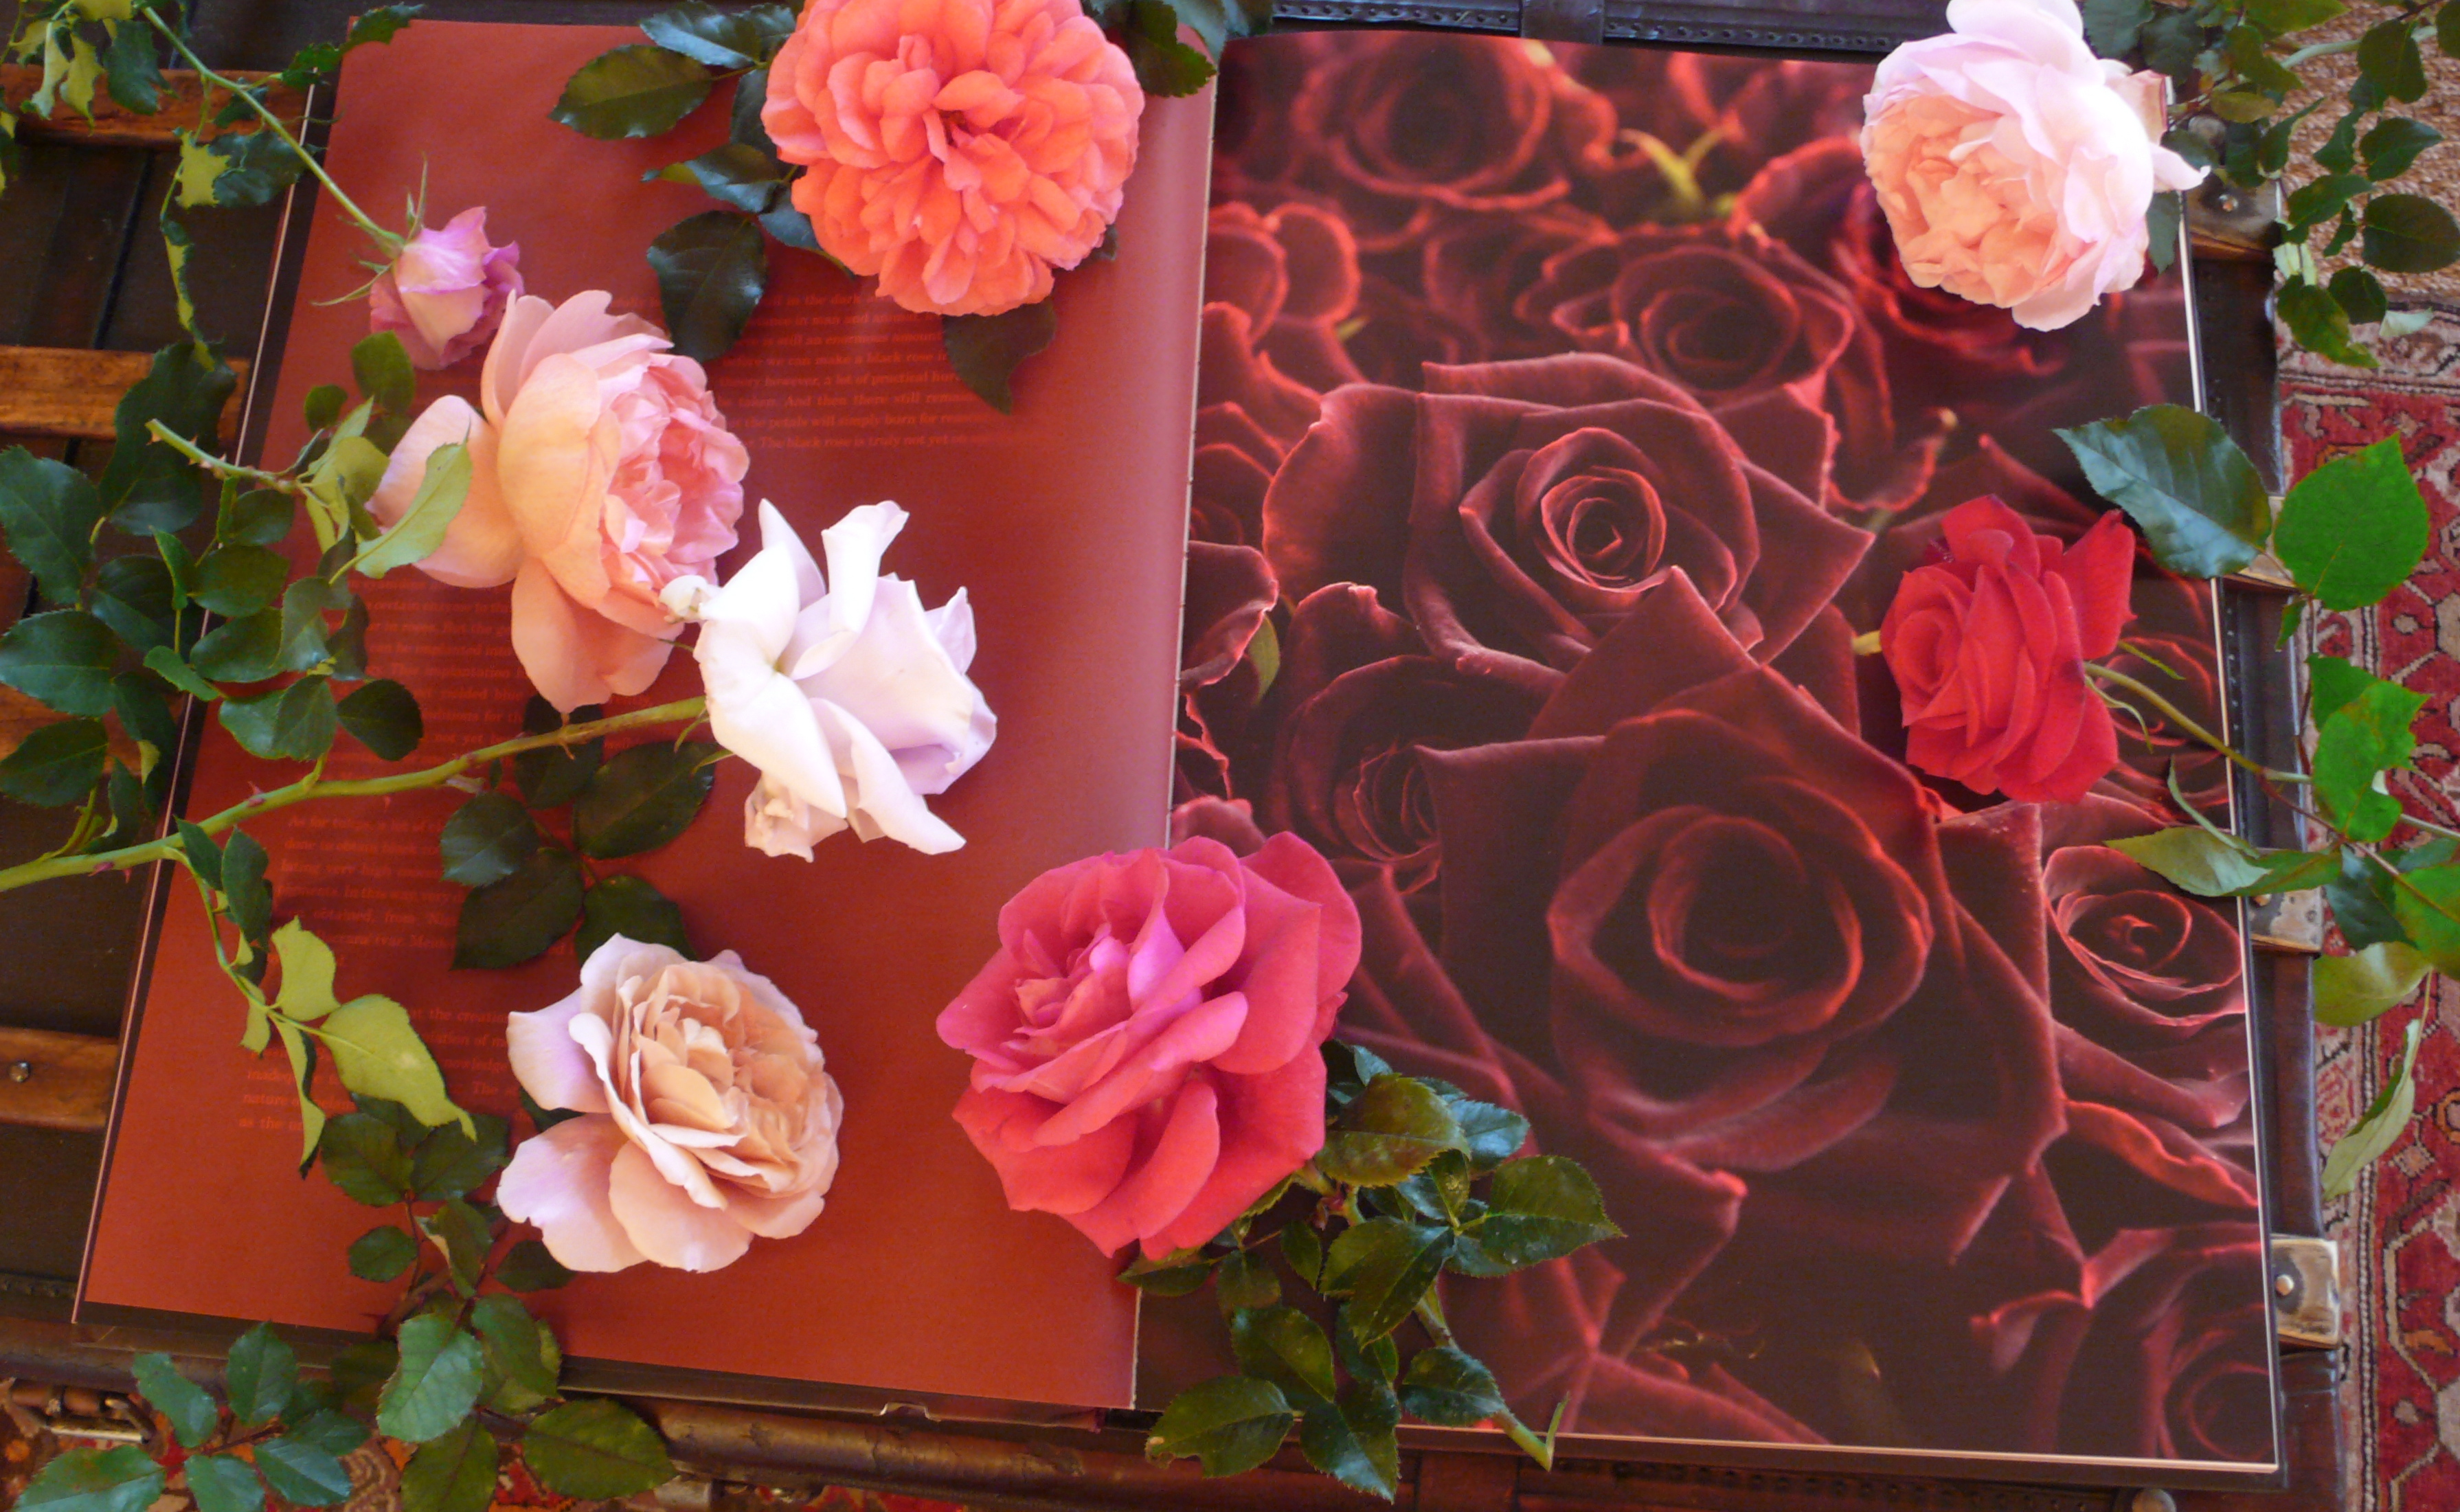 Roses, roses, roses, slimpaley.com